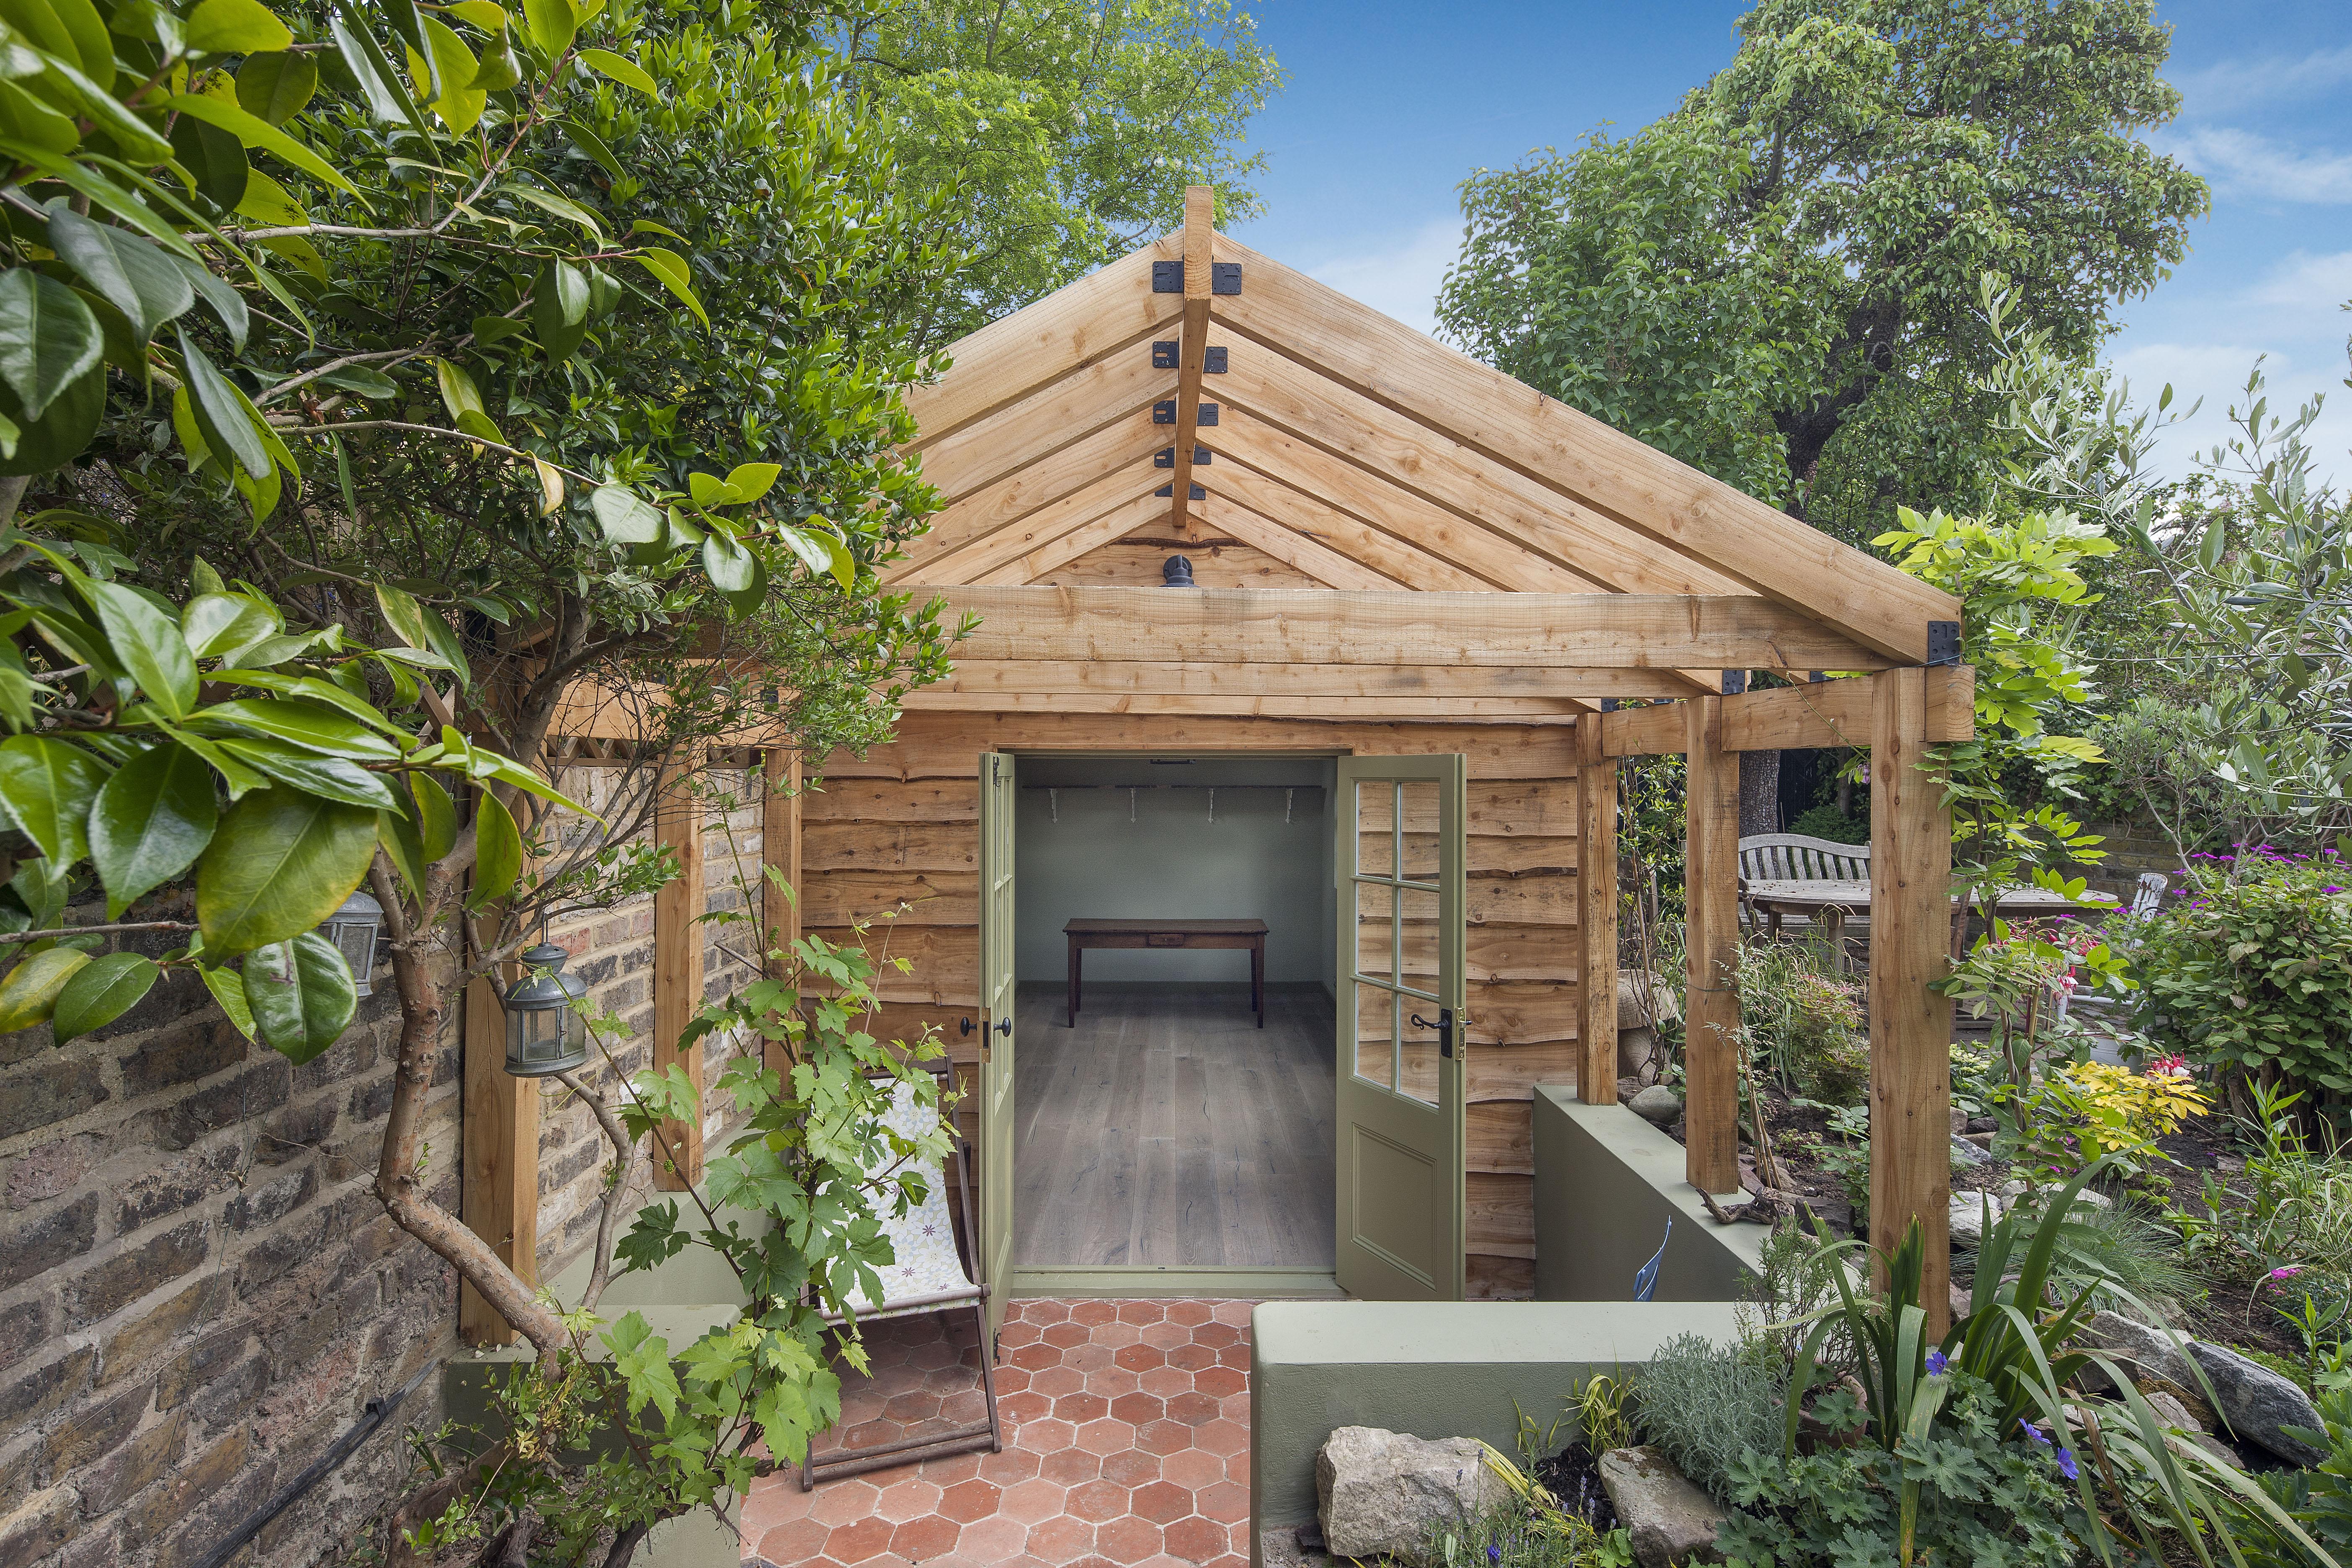 Garden Room and Pergola, Hammersmith